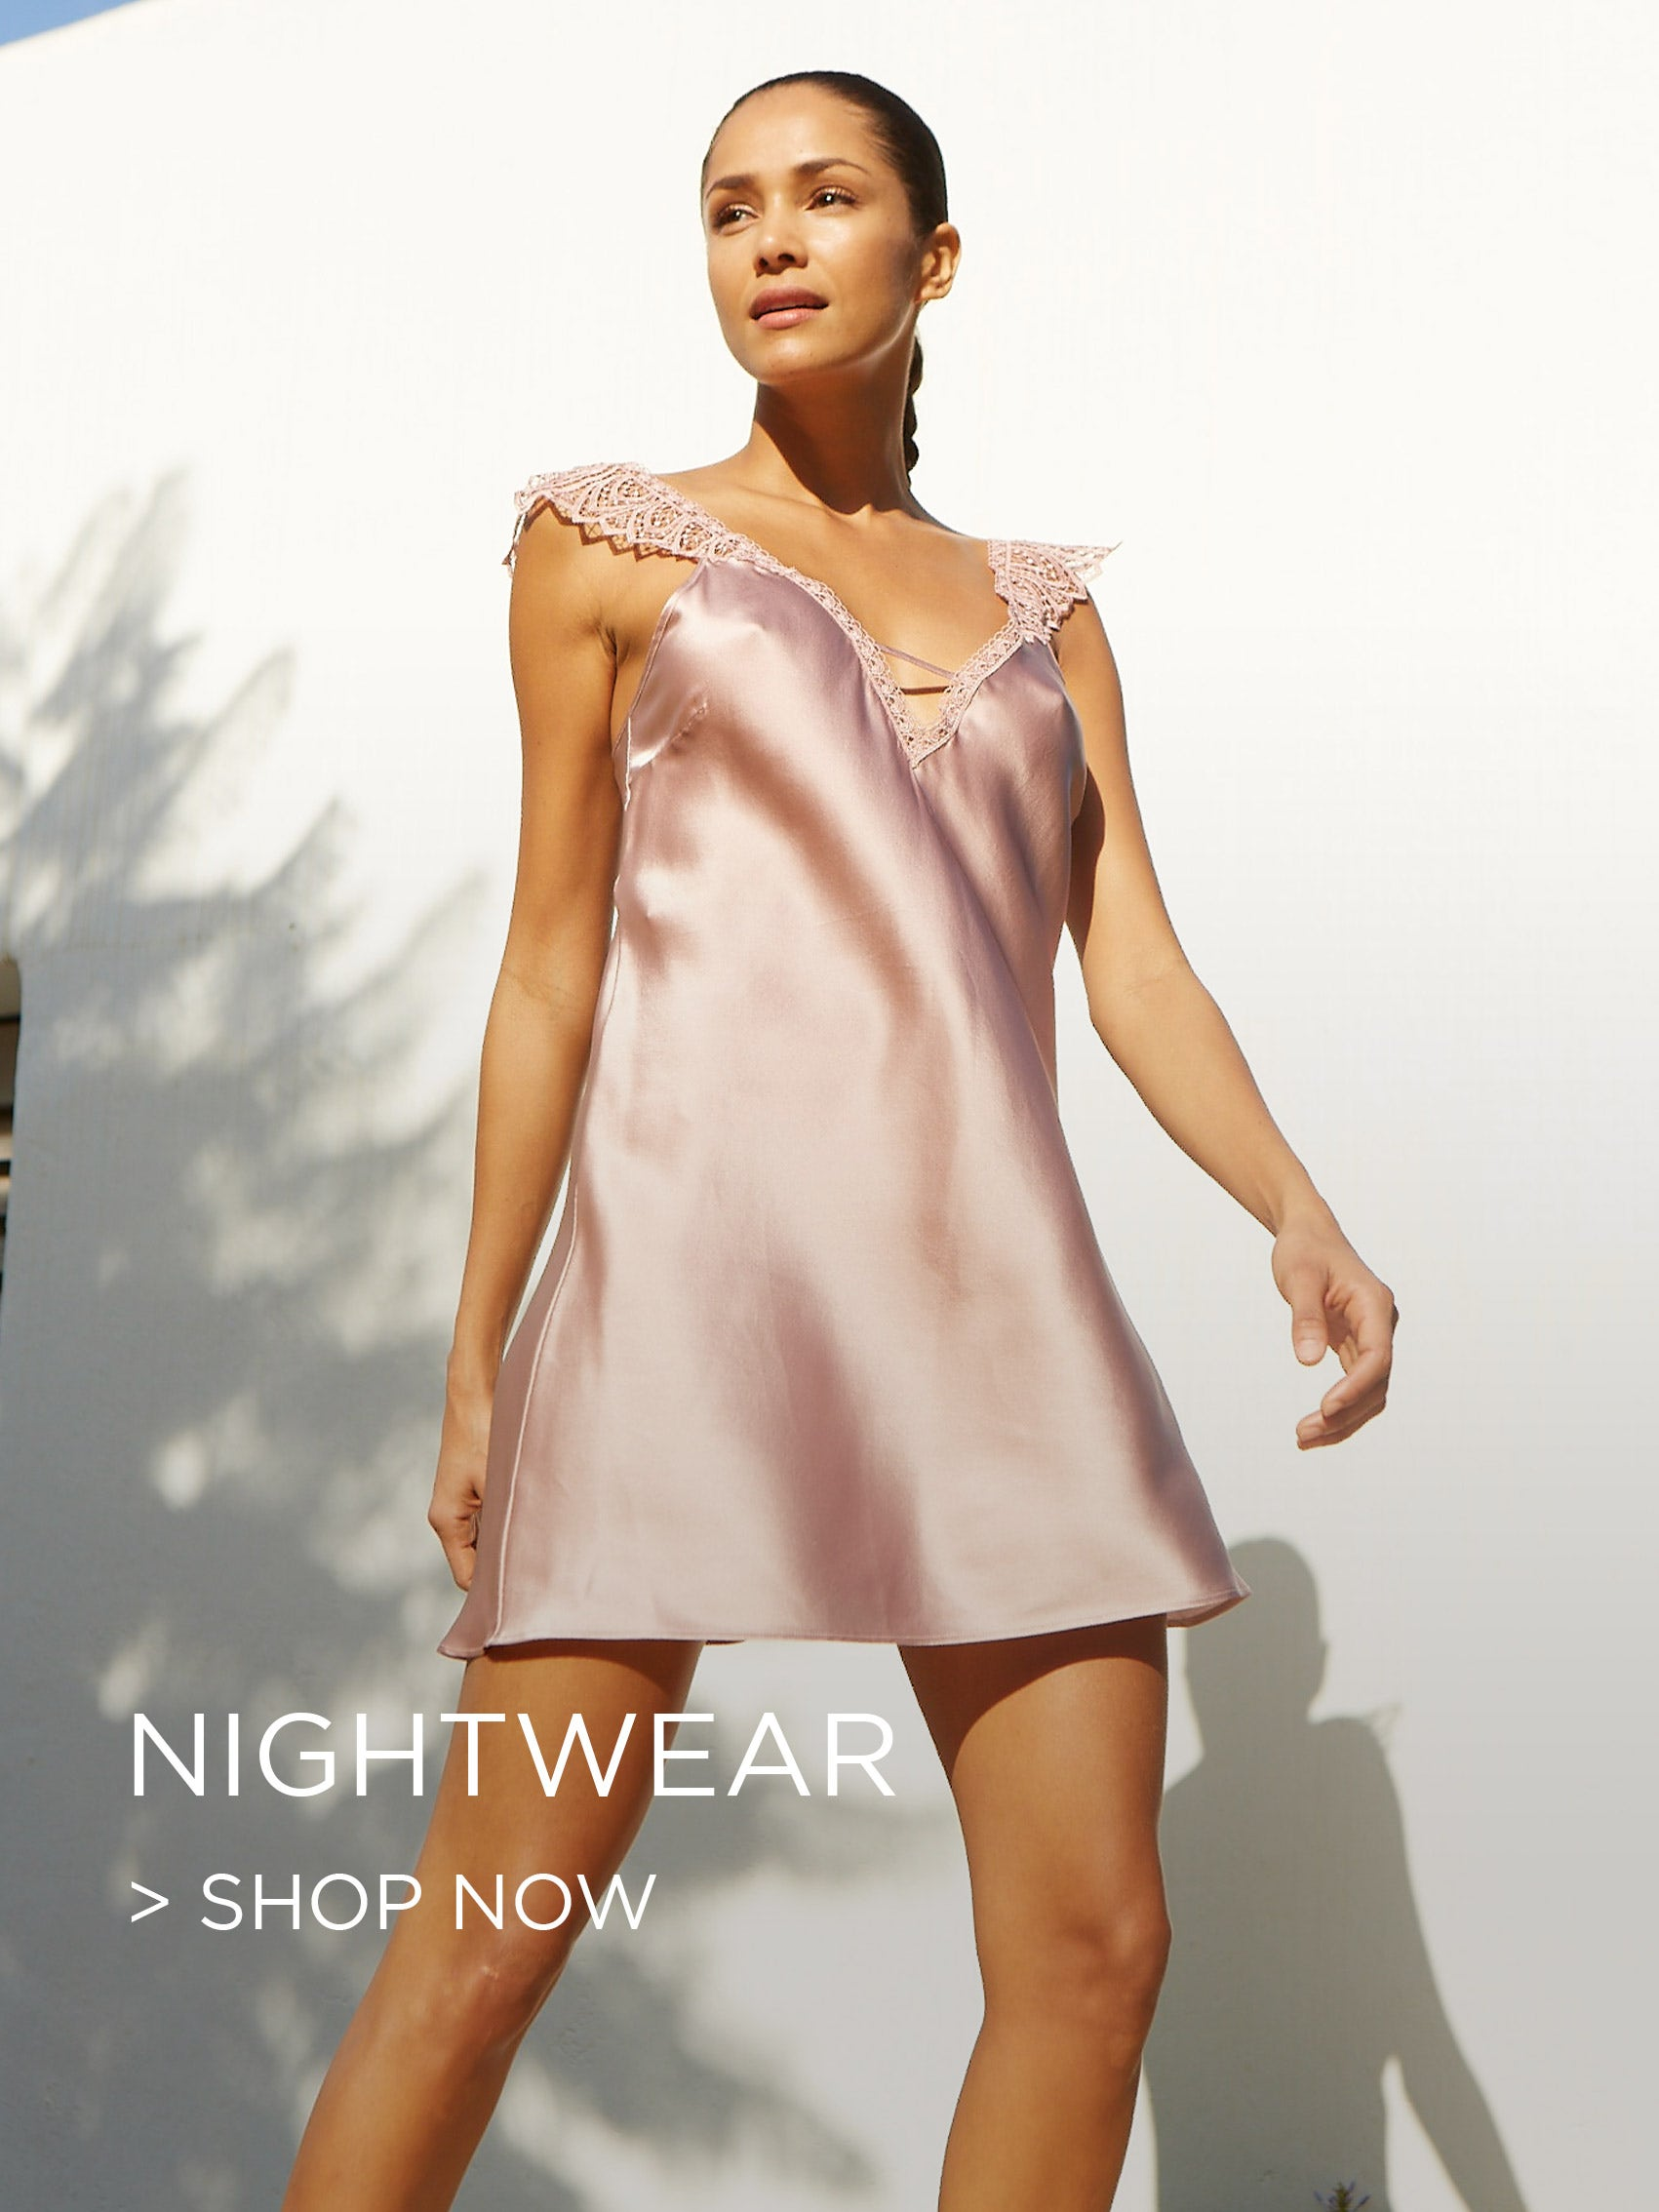 Nightwear on sale | Simone Pérèle